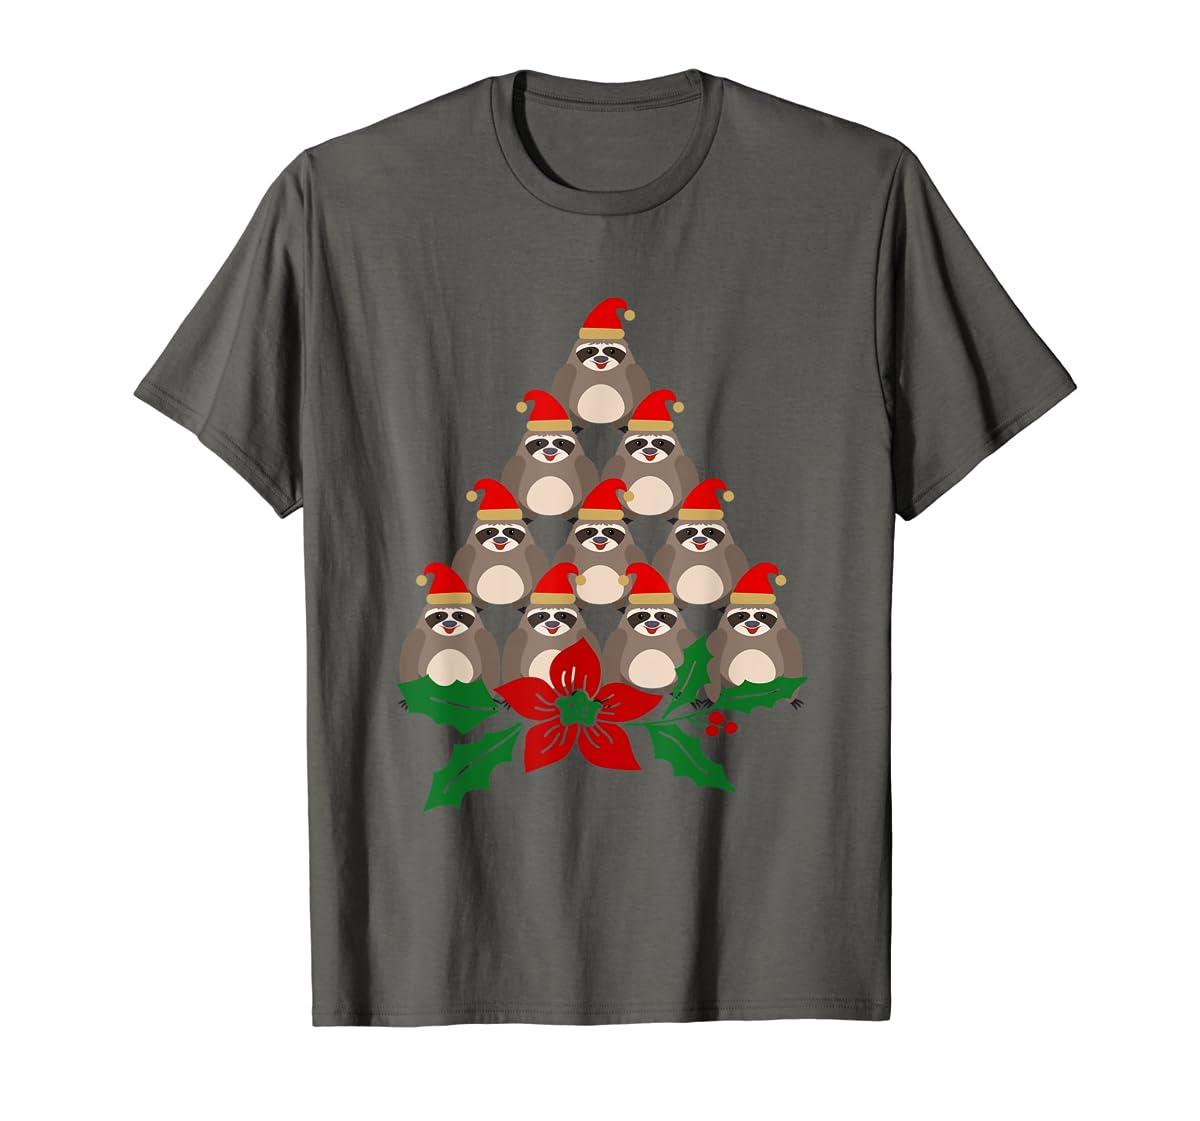 Sloth Christmas Tree Xmas Lover T-Shirt-Men's T-Shirt-Dark Heather